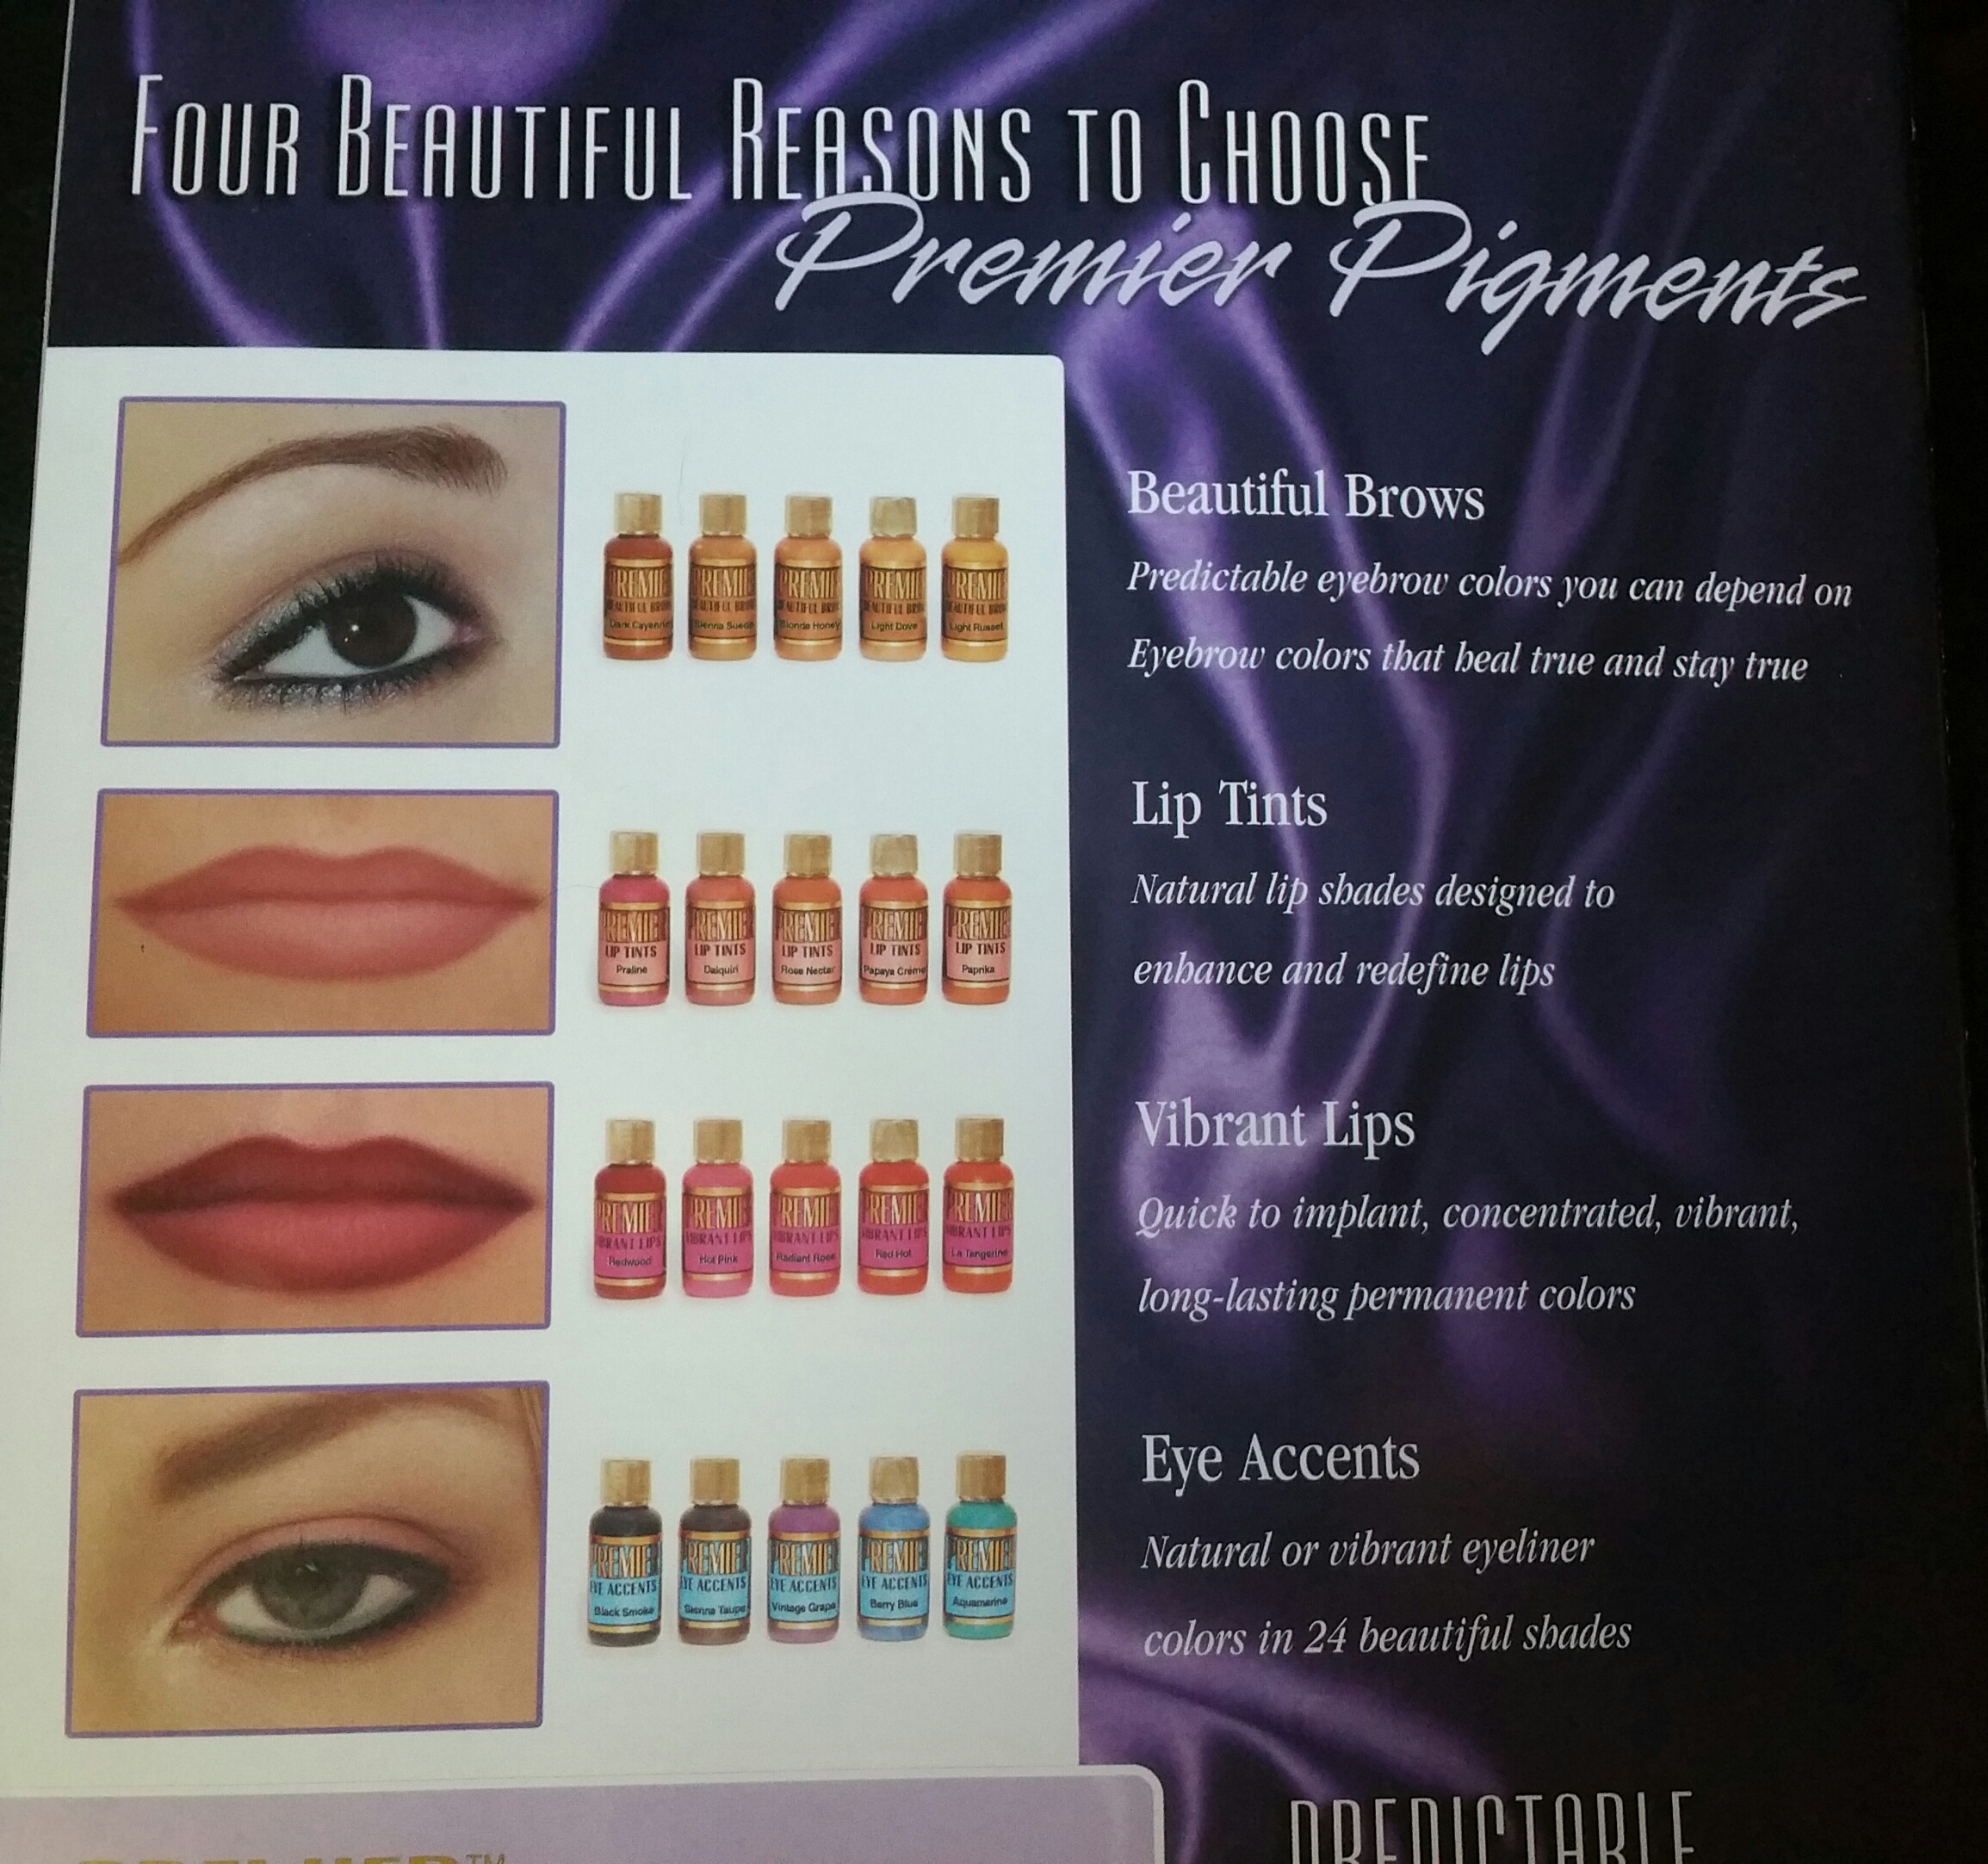 Quality Pigments!